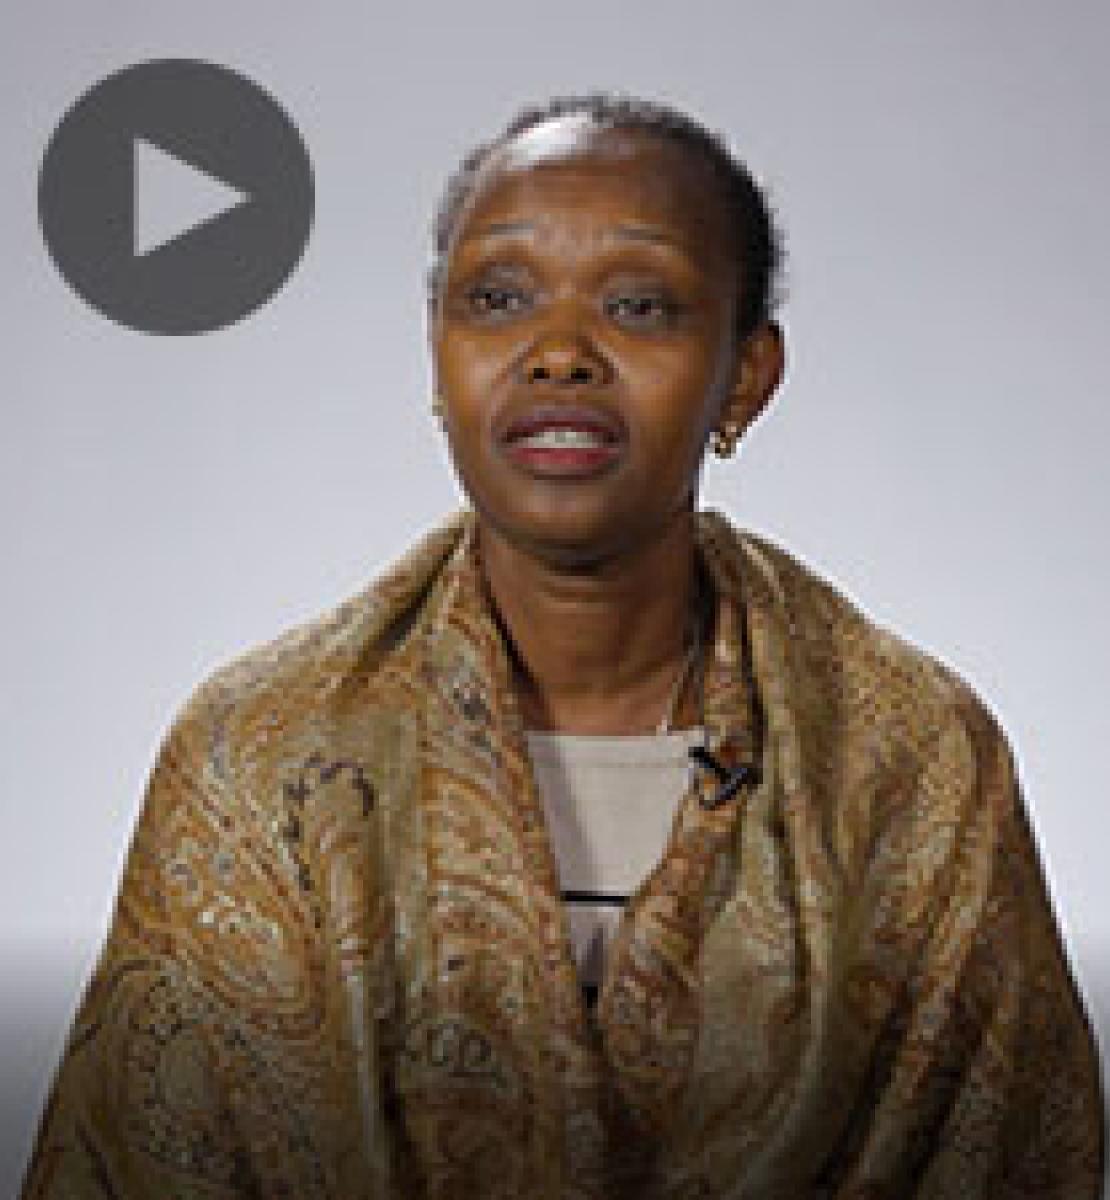 Screenshot from video message shows Resident Coordinator, Christine Umutoni